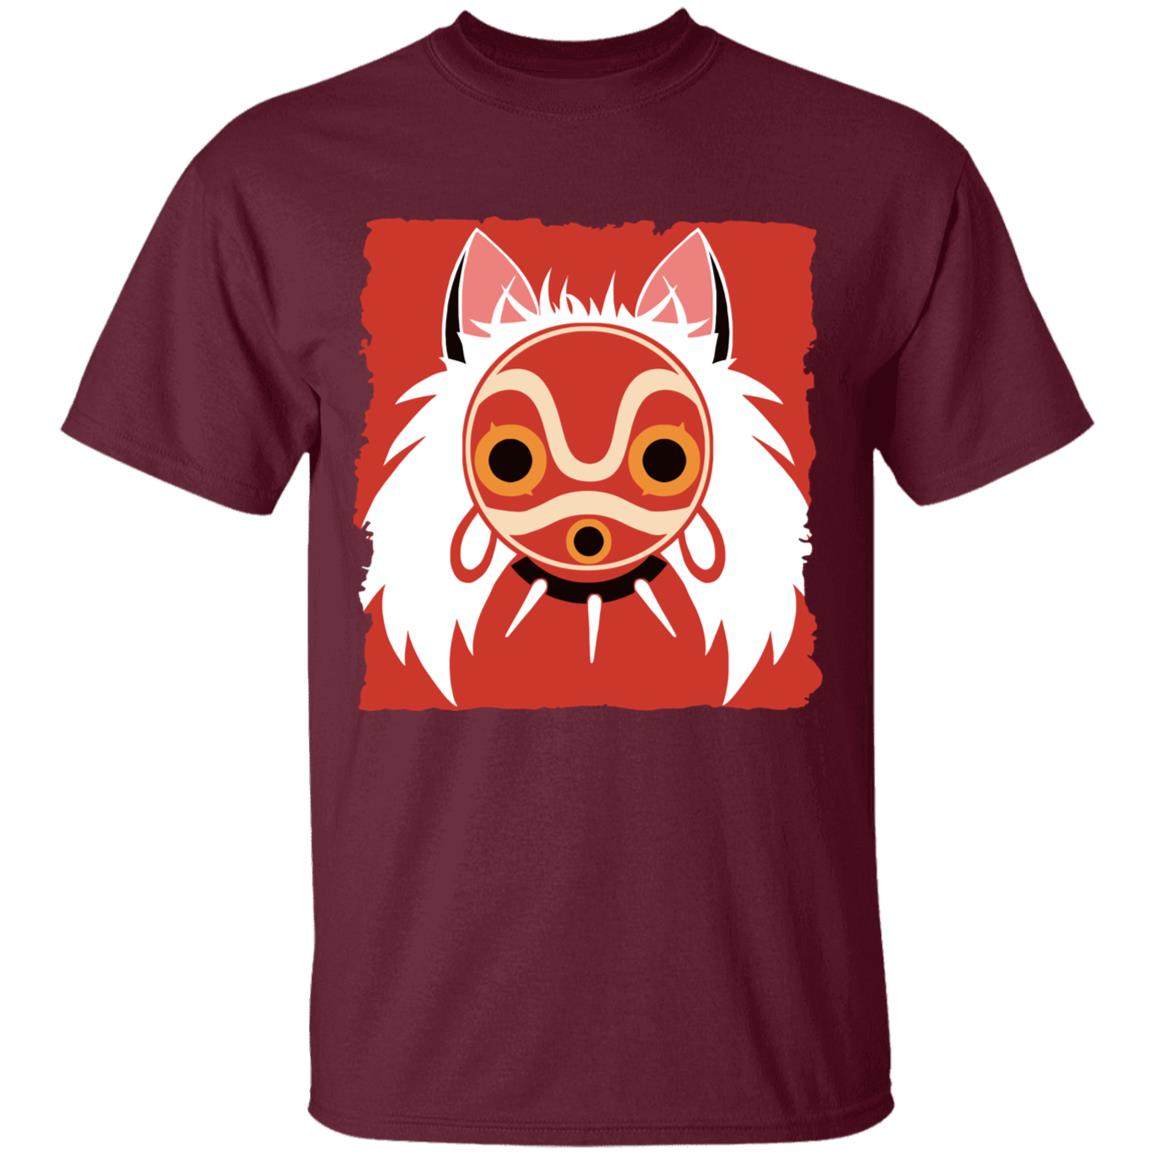 Princess Mononoke Mask Classic T Shirt